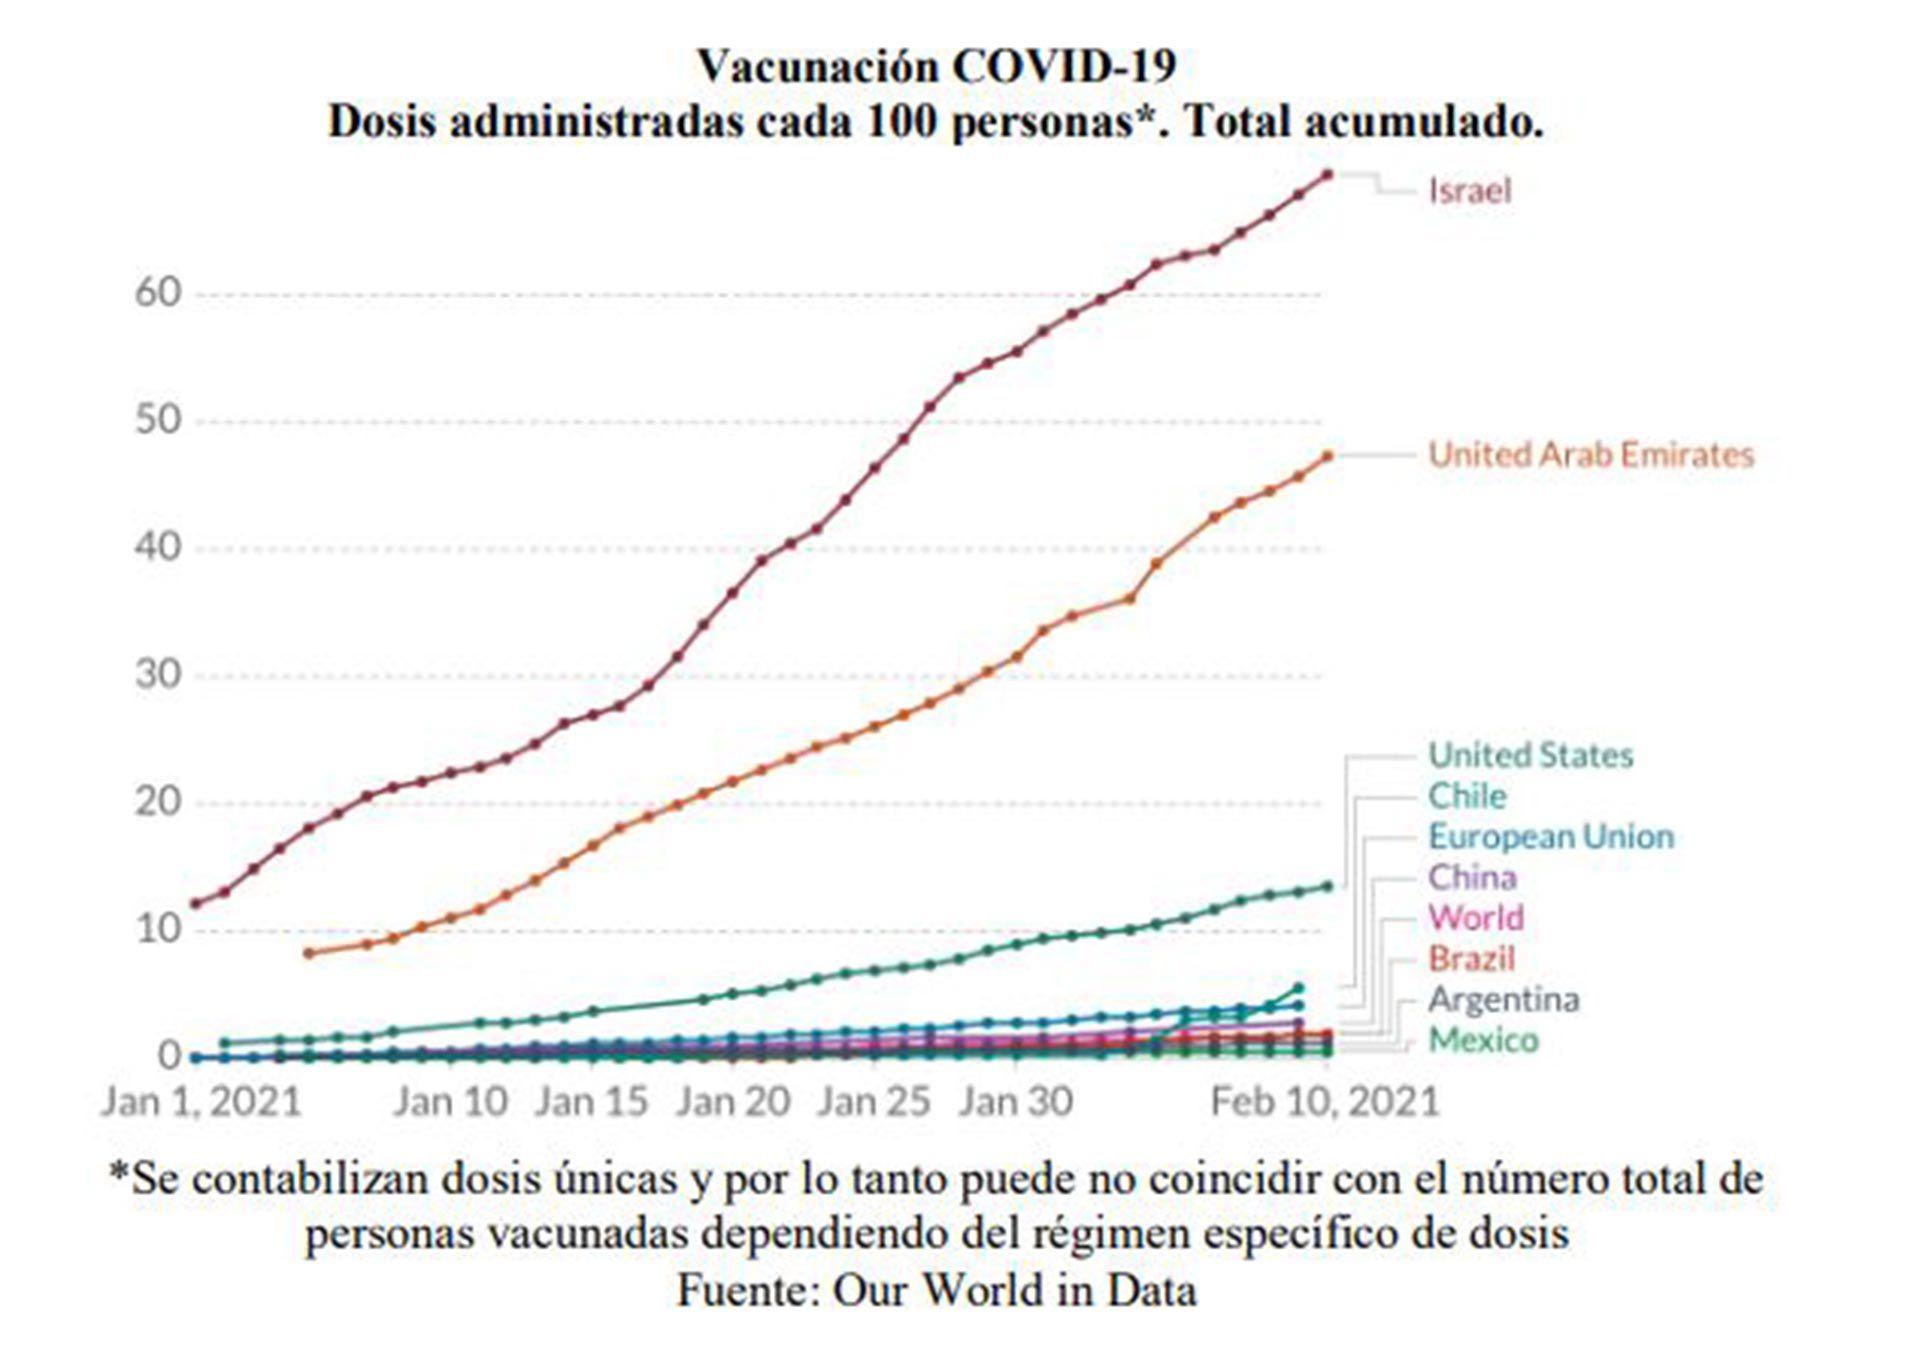 Pandemia PBI Empleo Salario Expo Impo Dólar Vacunas